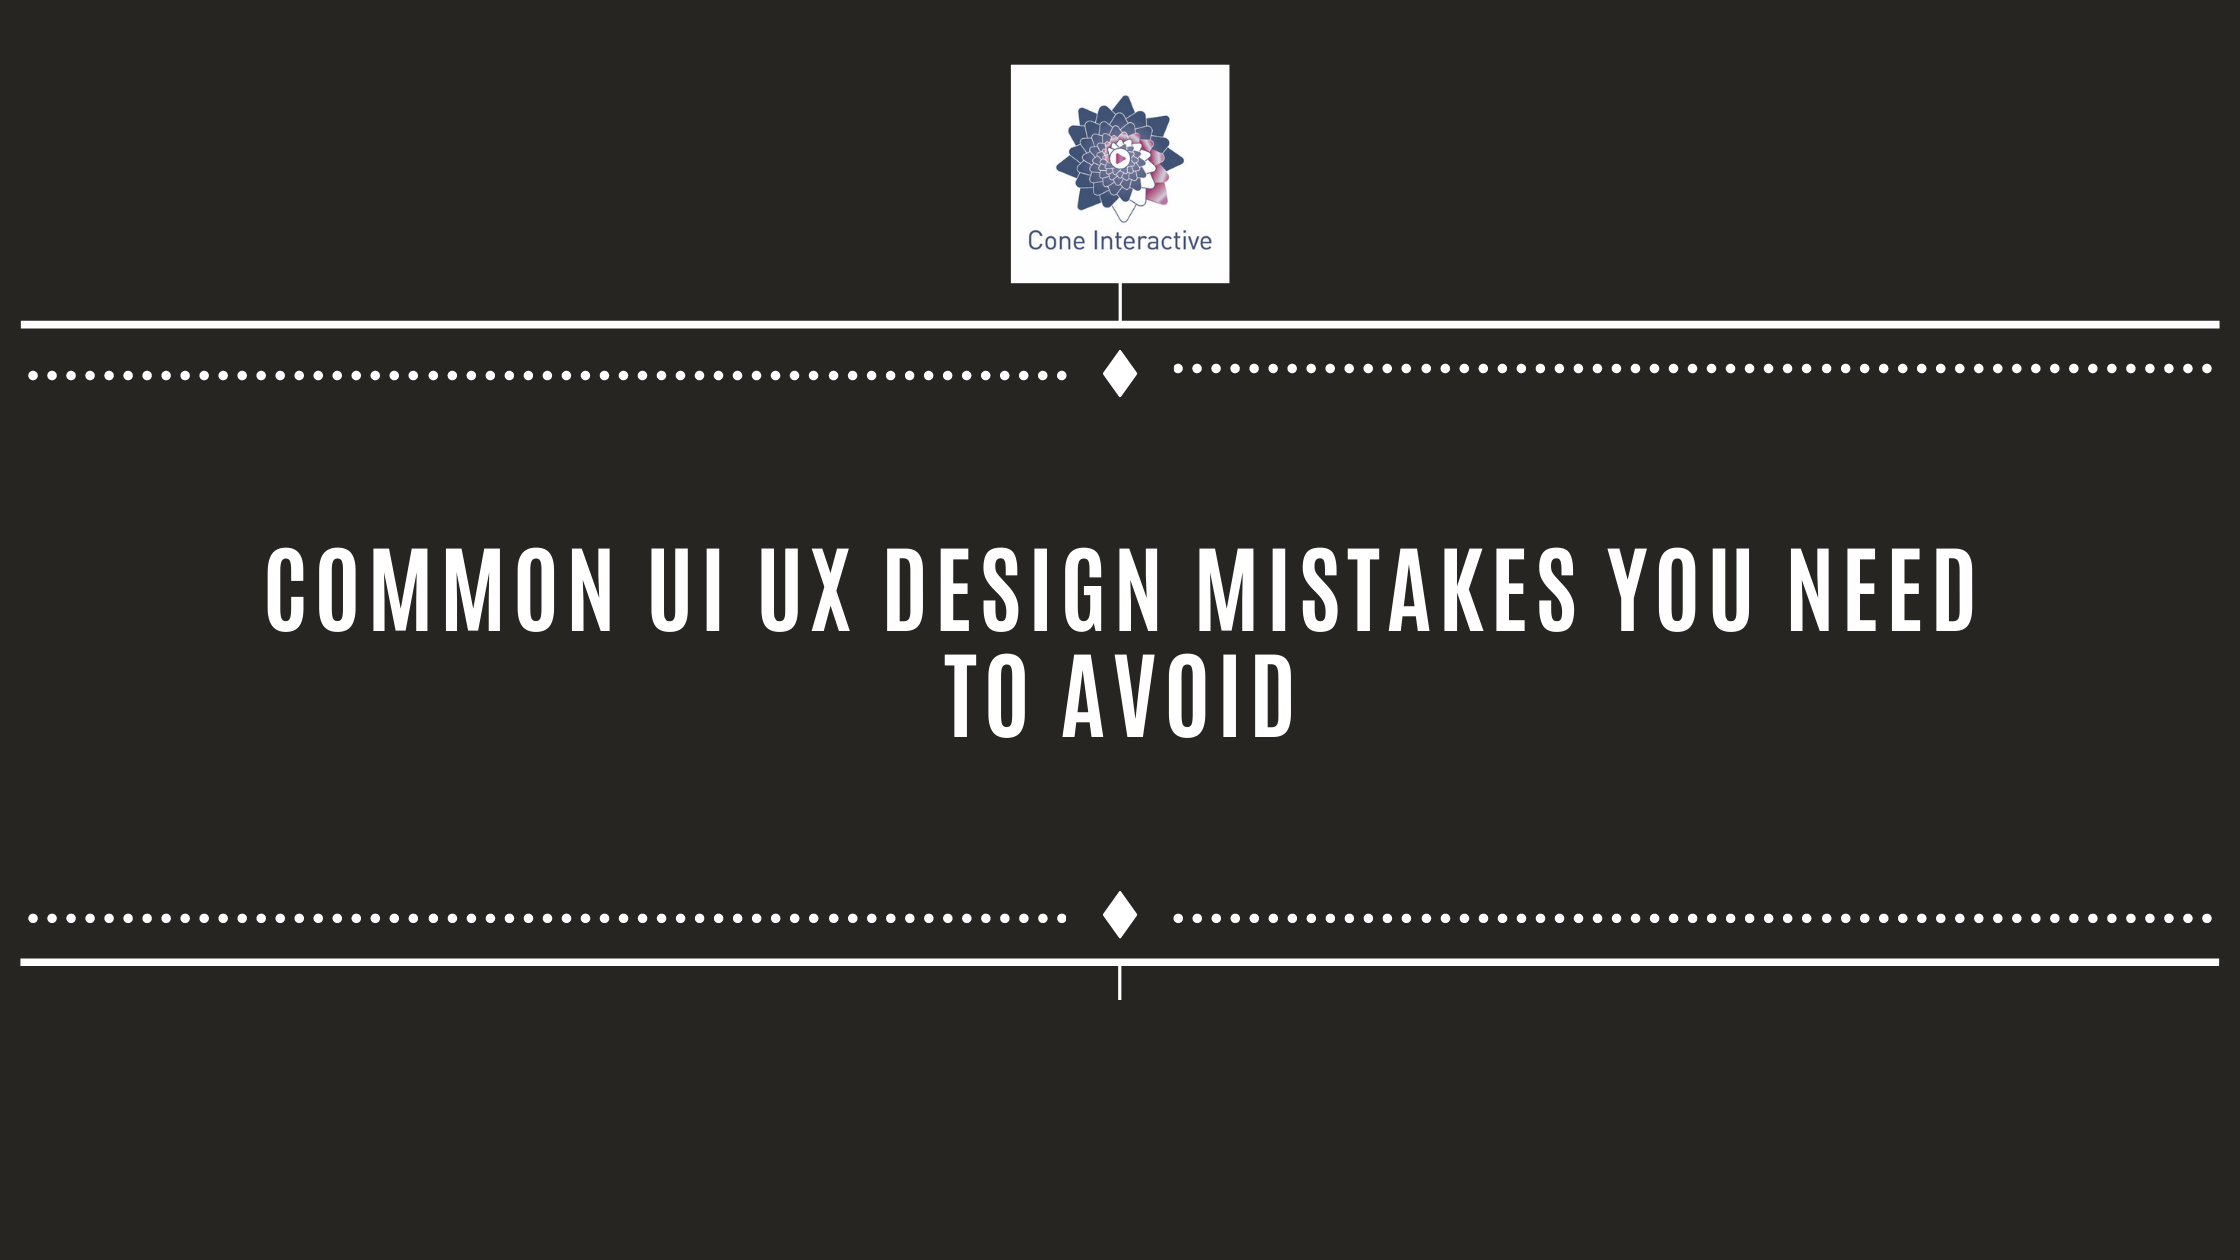 Common UI UX Design Mistakes